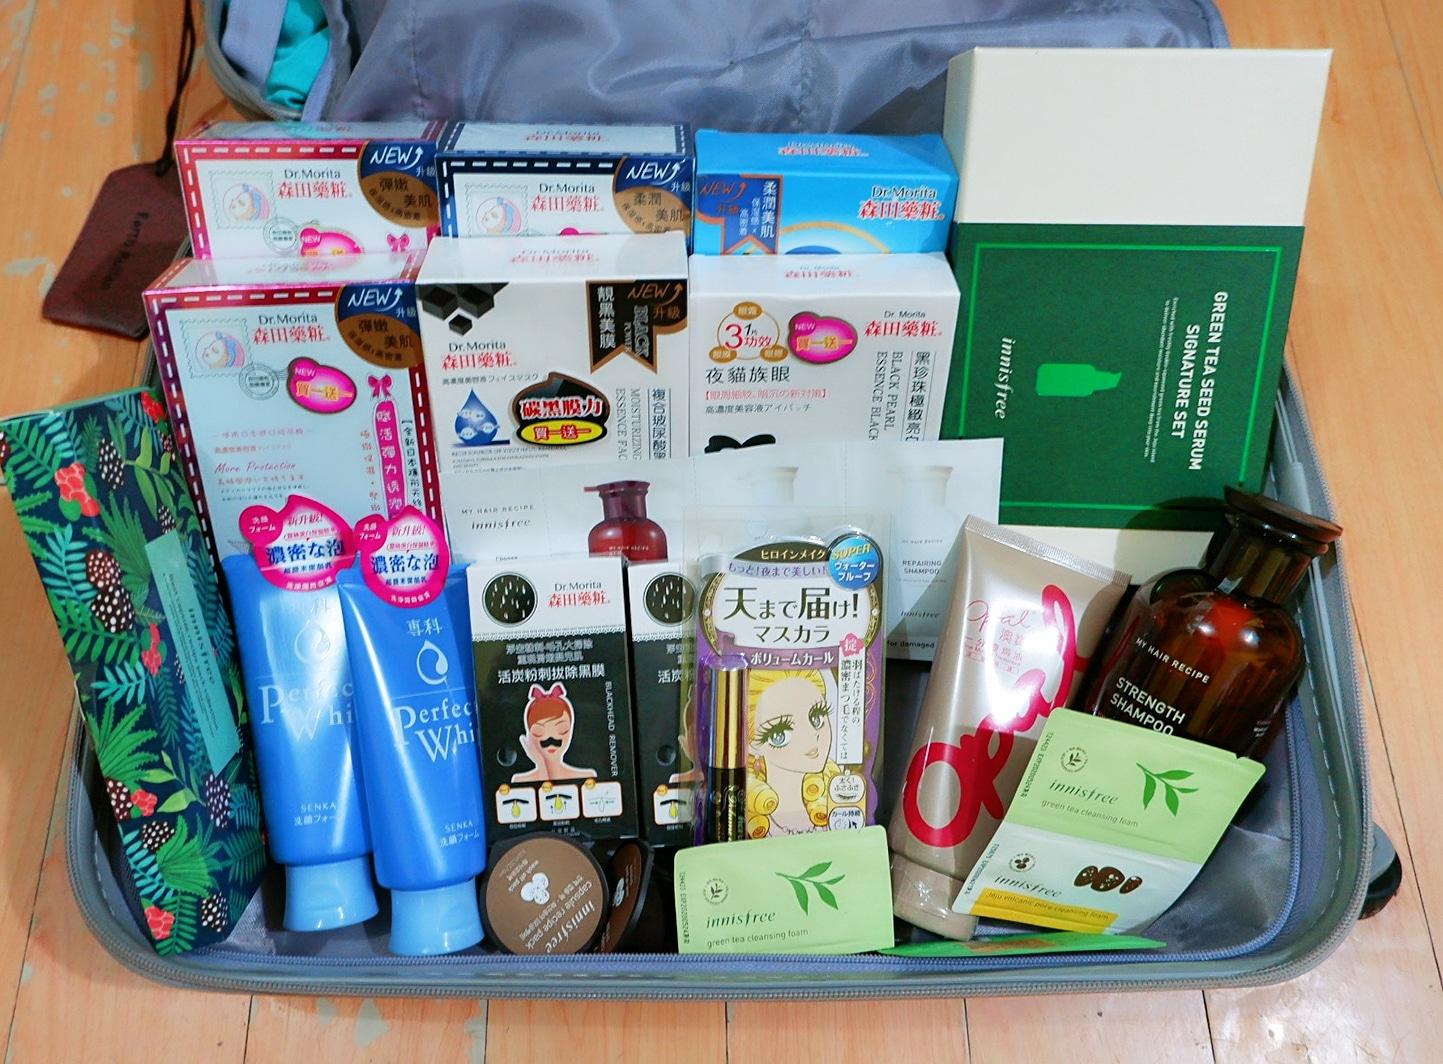 Taiwan beauty haul #EarthinTaiwan